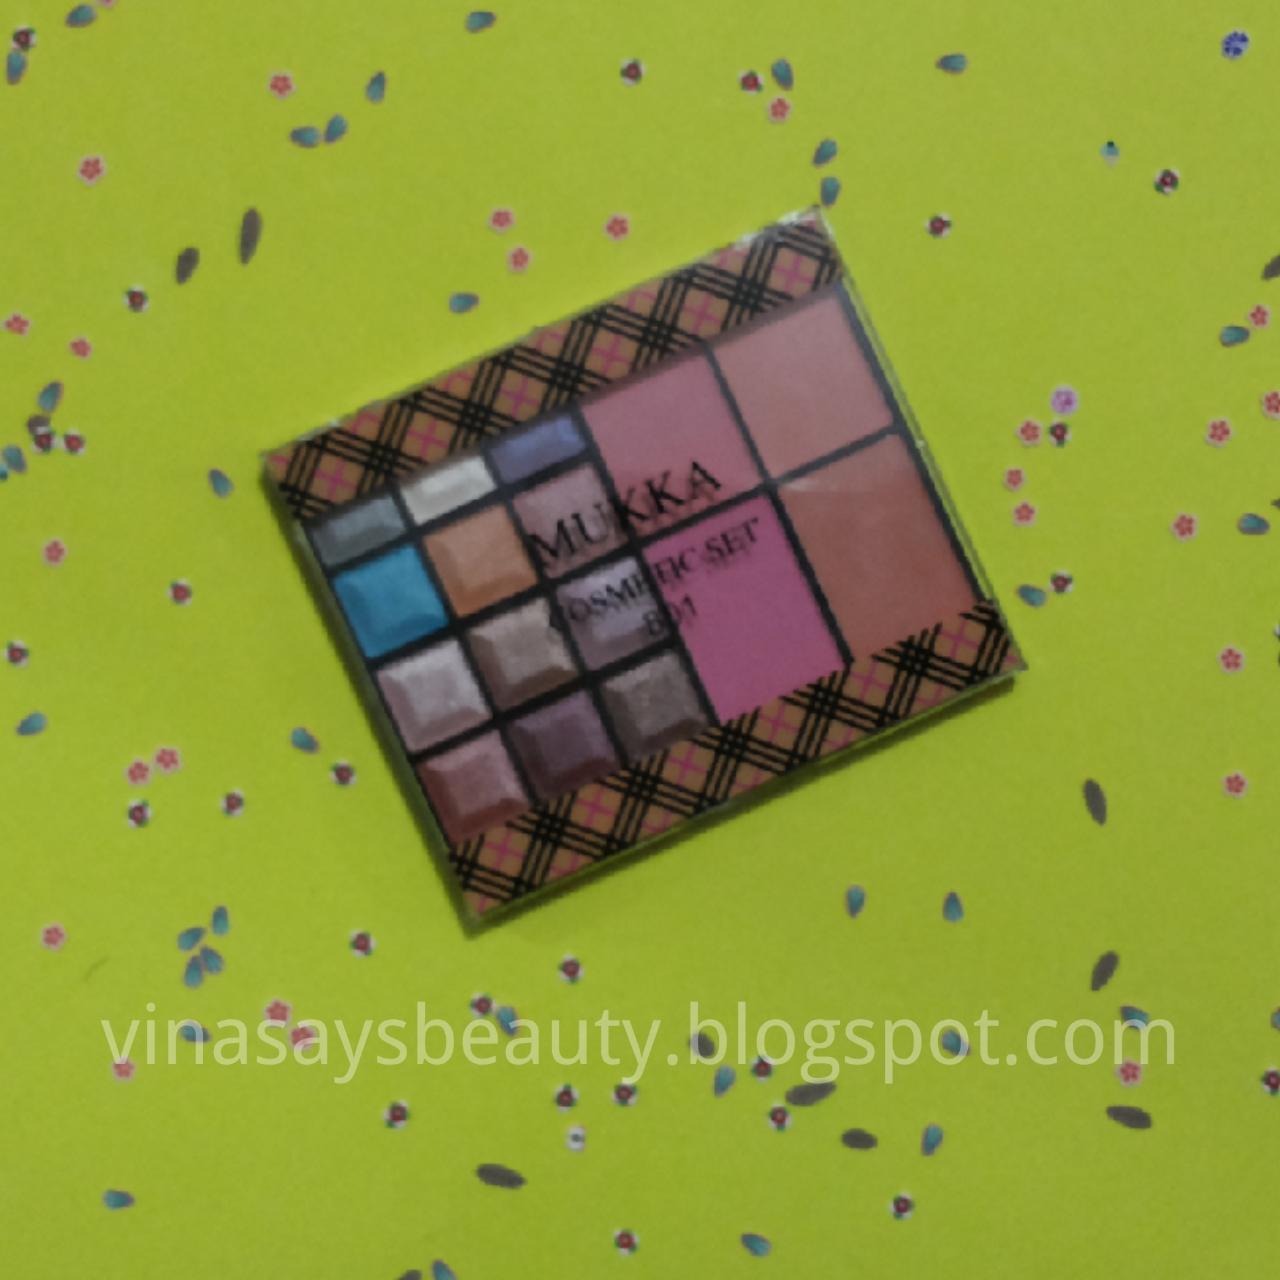 Review Mukka Eyeshadow Dan Blush On Code 801 Vina Says Beauty Eye Shadow 7016